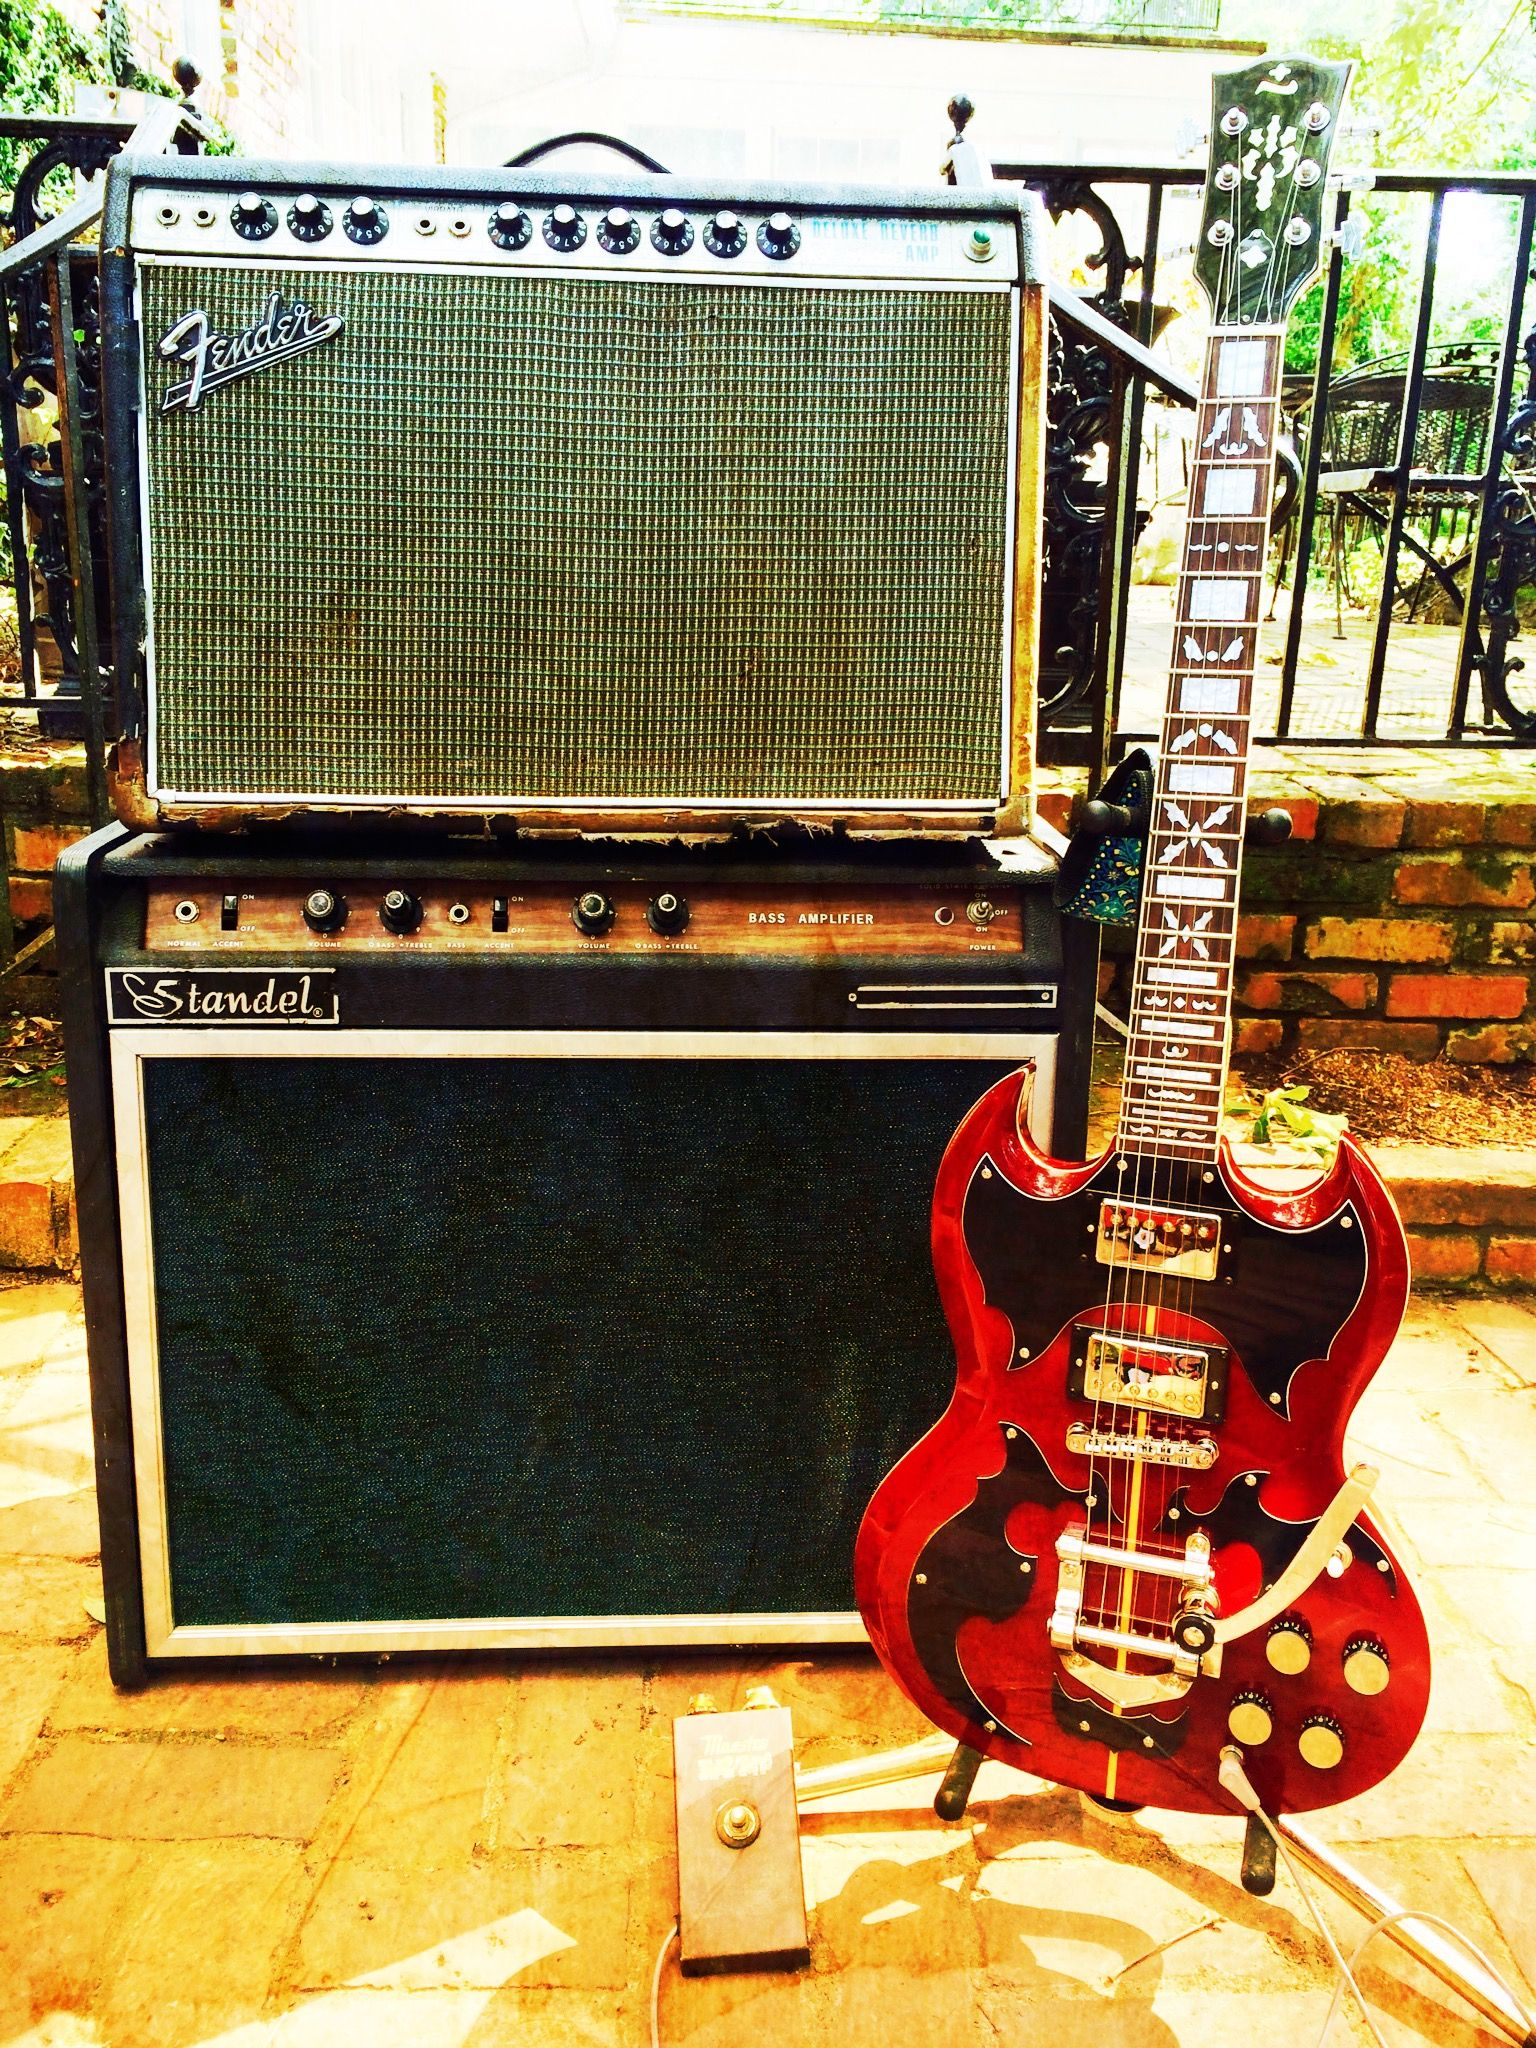 john cipollina tribute rig john cipollina guitars vintage guitars [ 1536 x 2048 Pixel ]